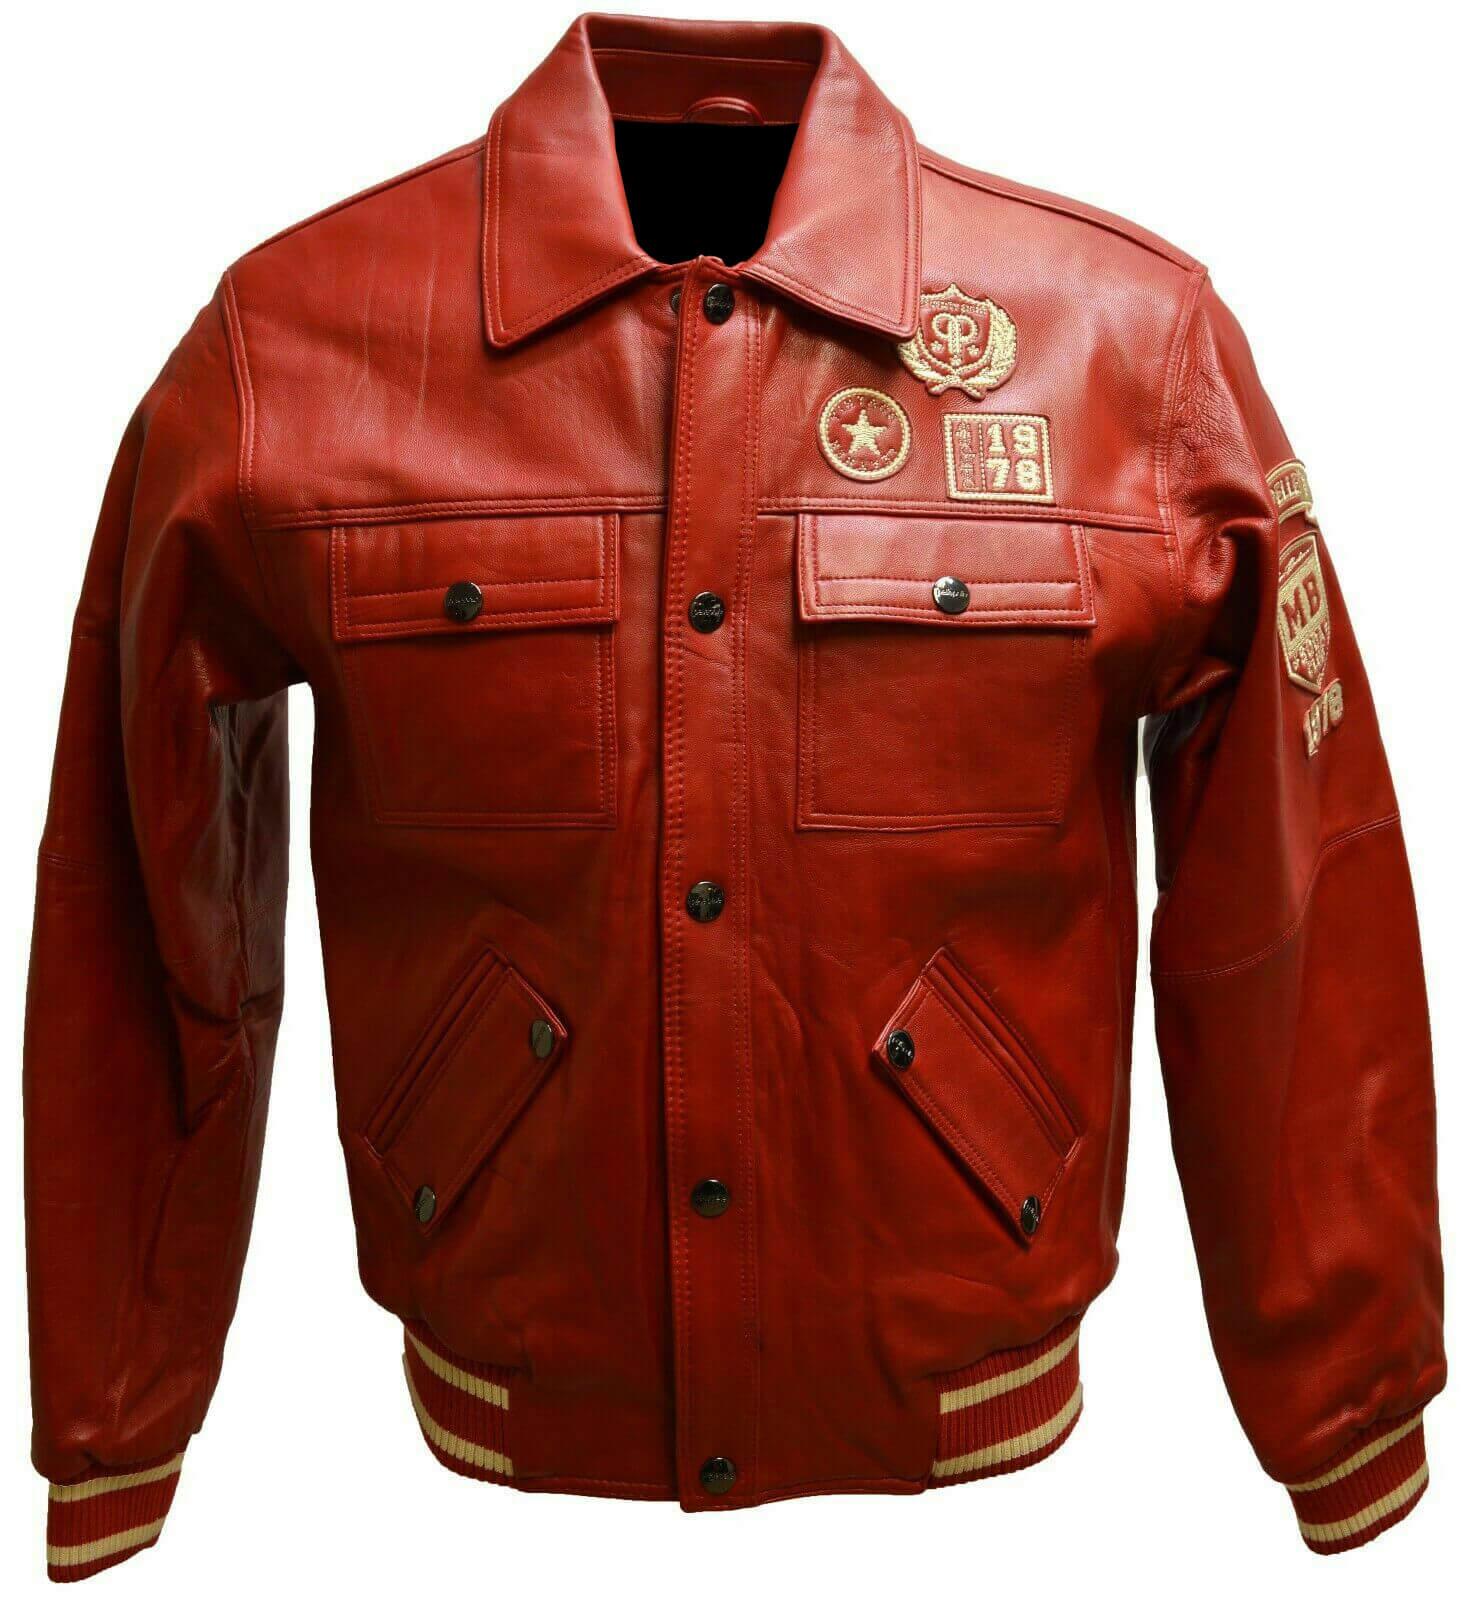 Pelle Pelle Red Marc Buchanan Vintage Leather Jacket